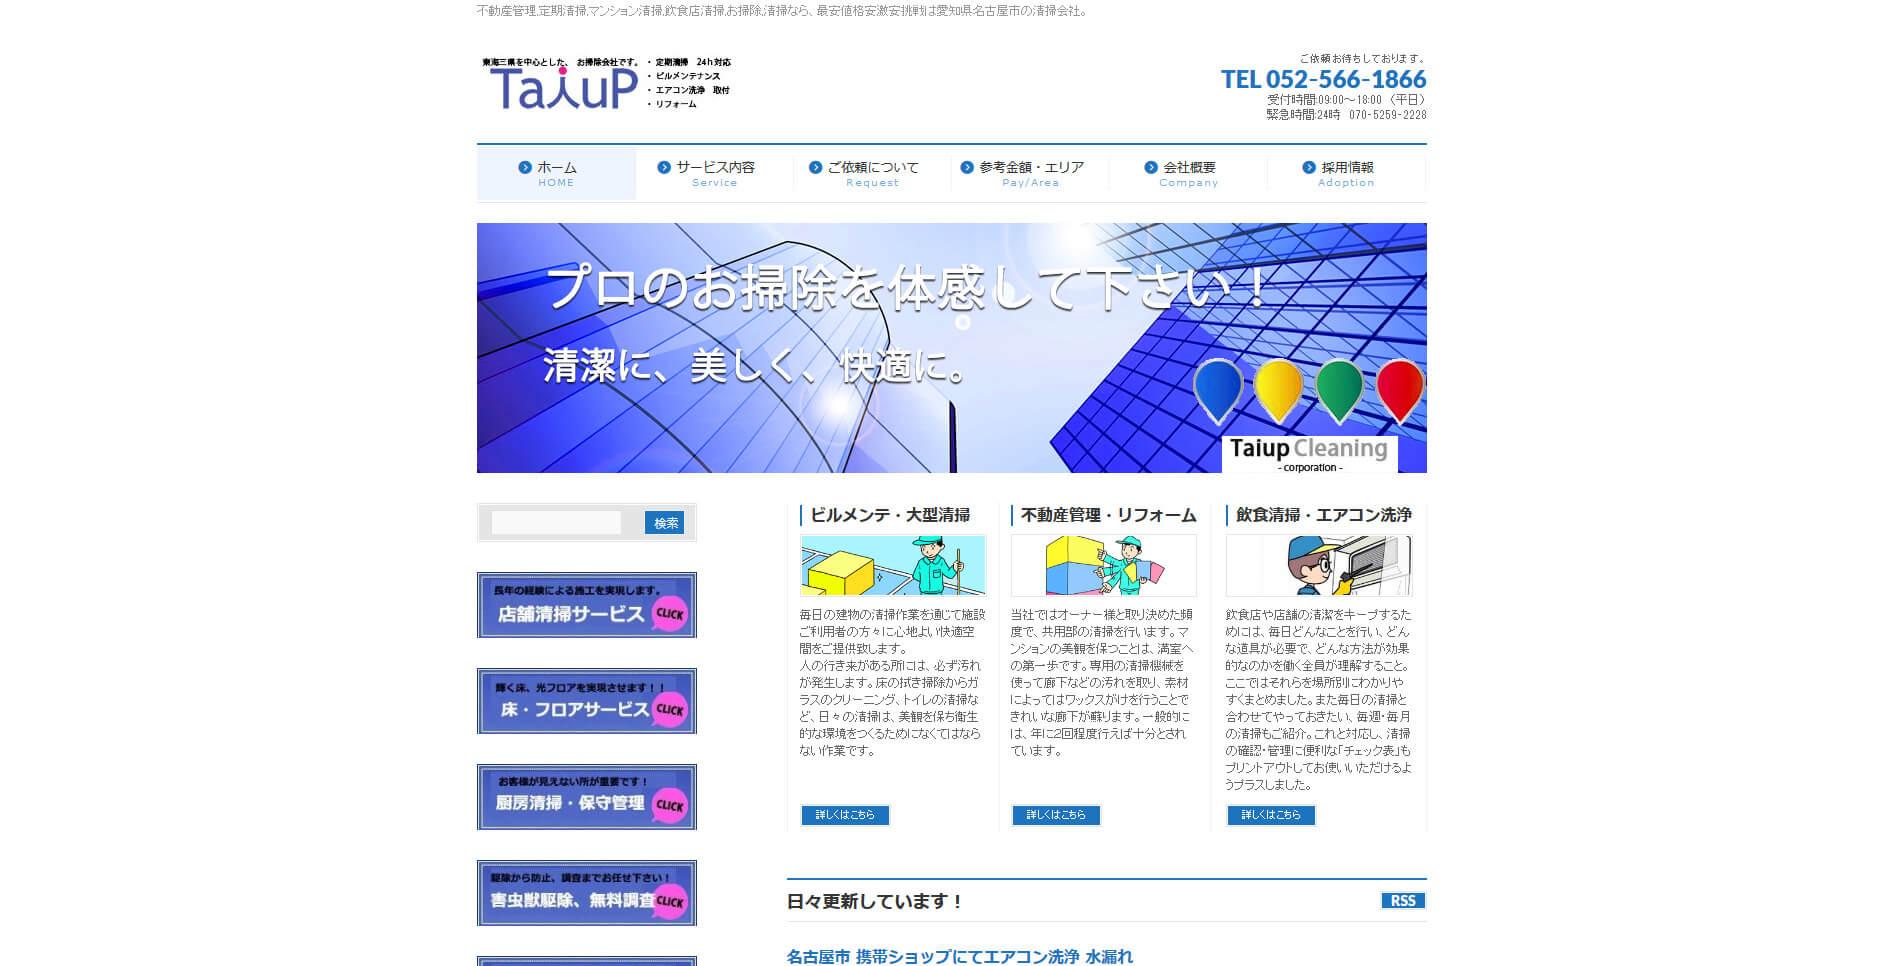 株式会社Taiup